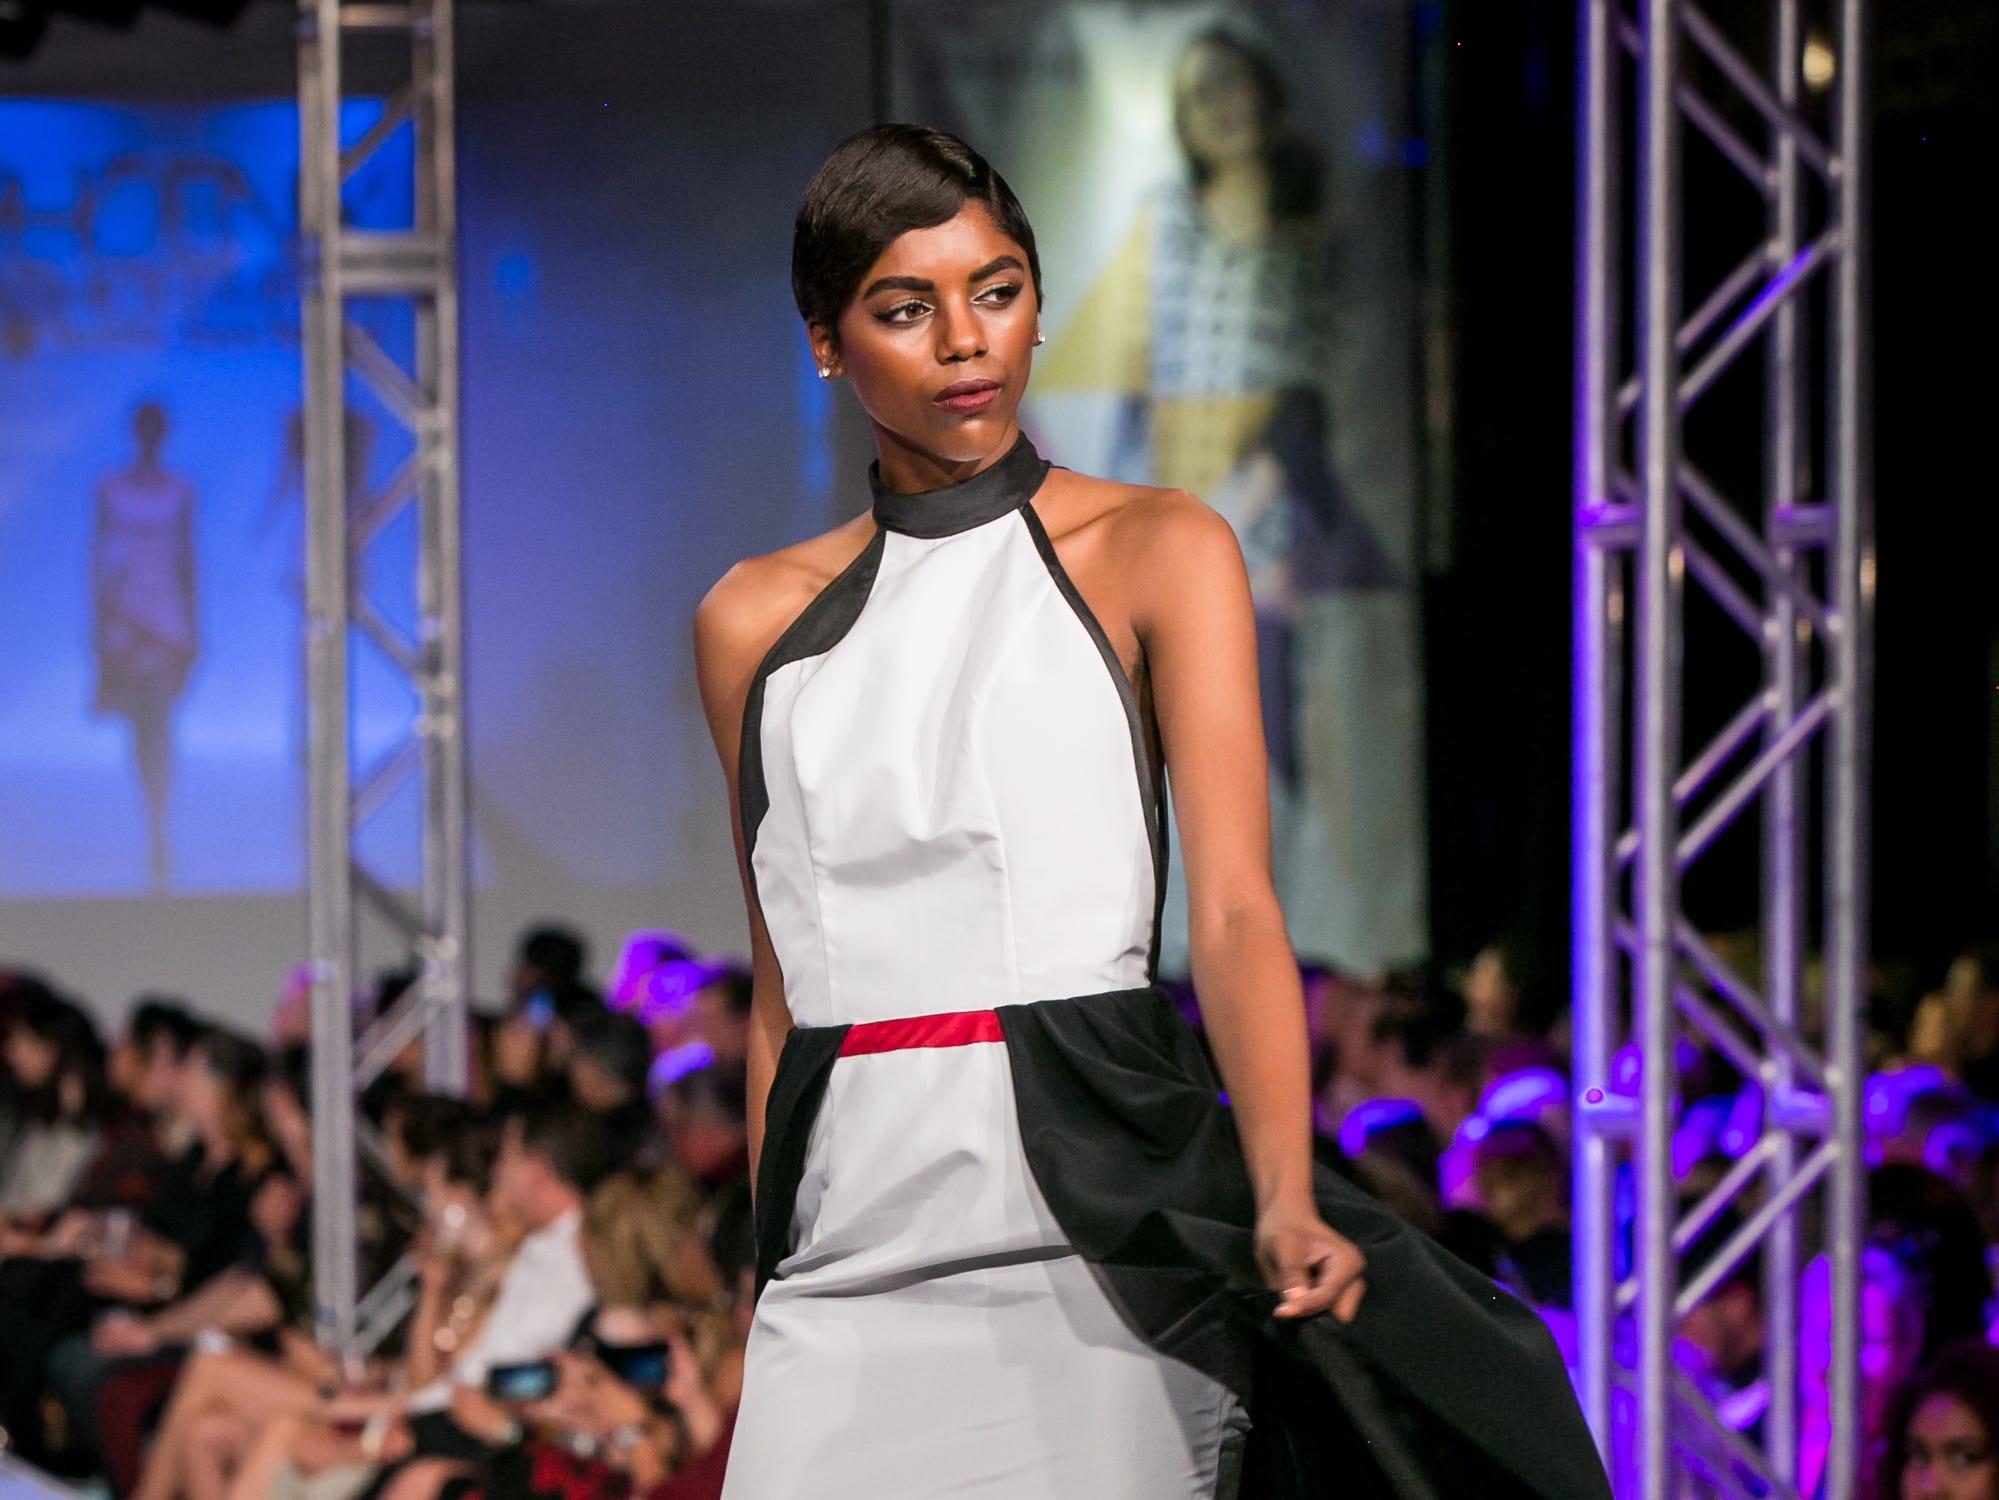 ACONAV's runway during Phoenix Fashion Week at Talking Stick Resort in Scottsdale on Saturday, October 20, 2018.